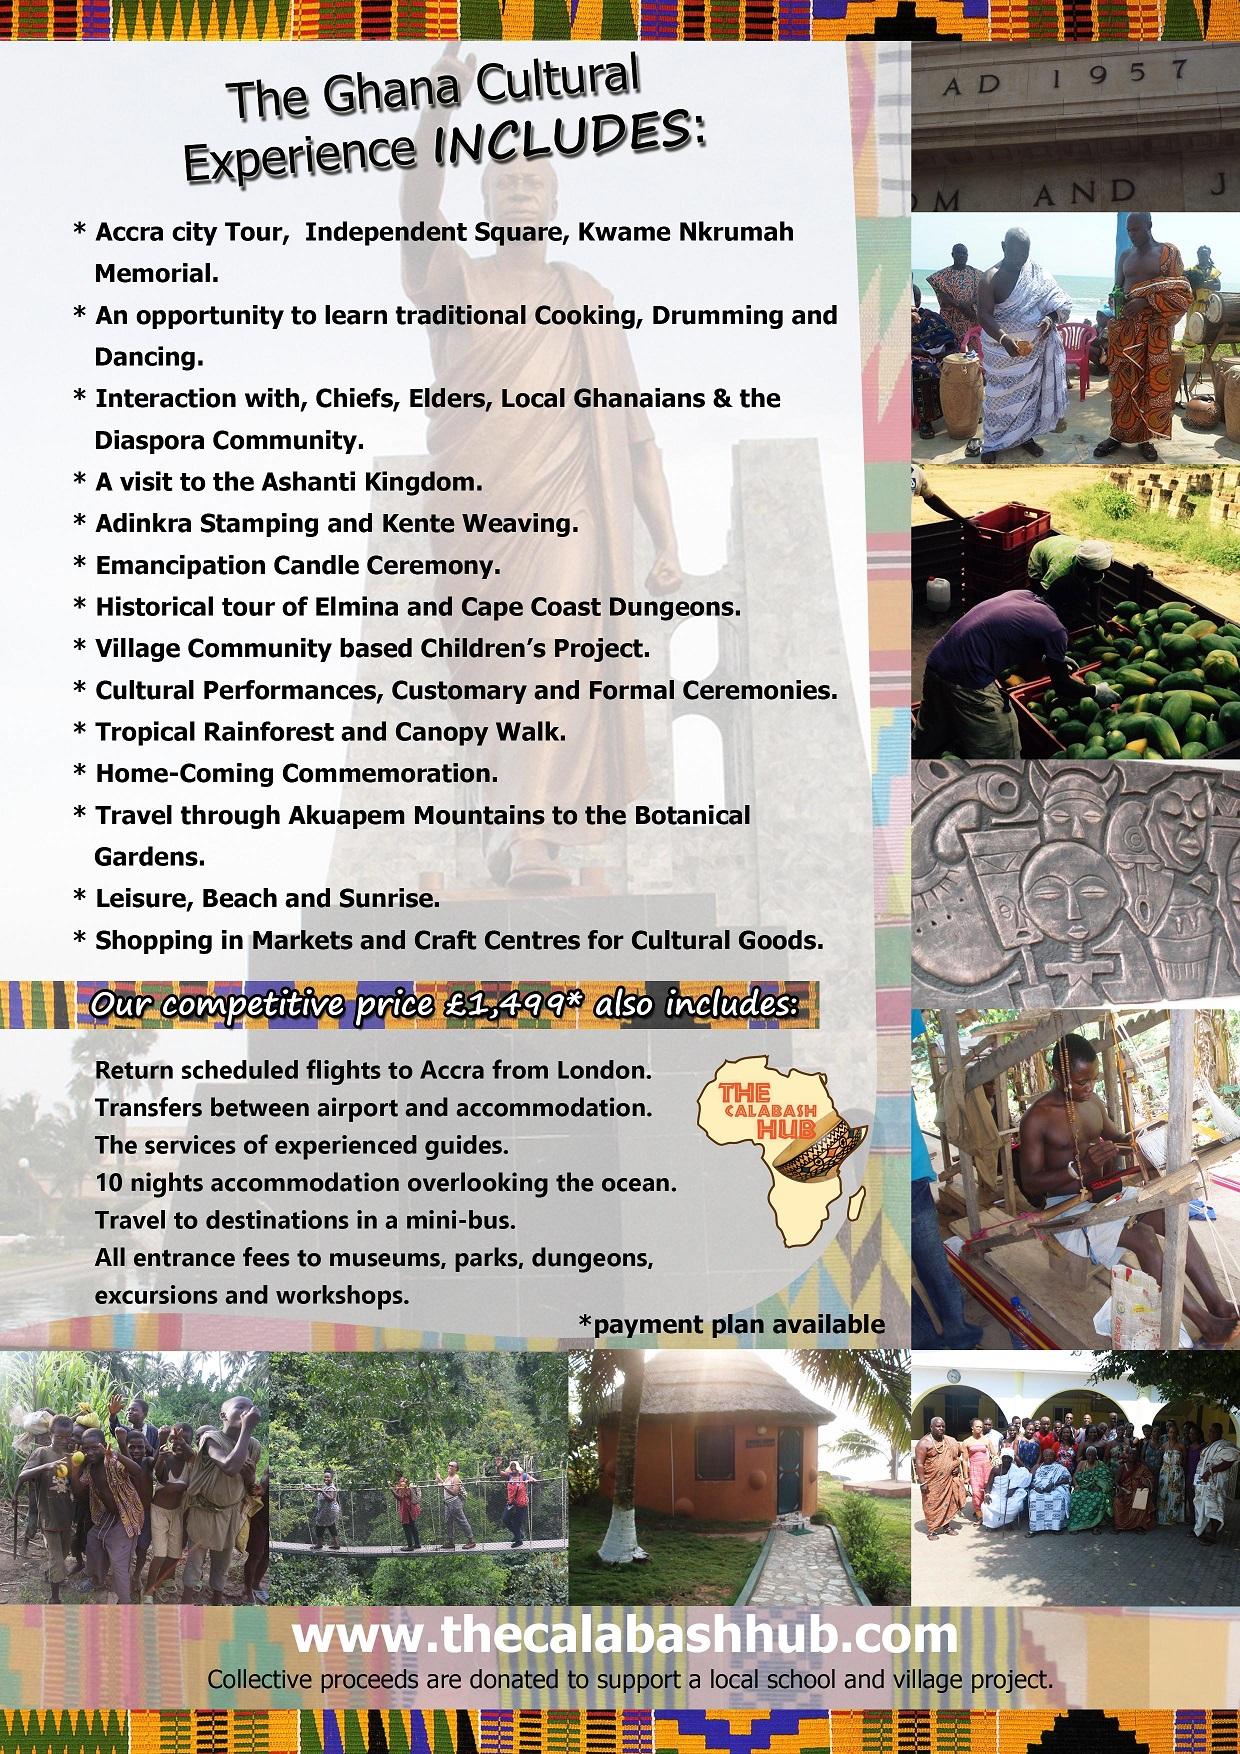 Ghana Cultural Experience 2018 - Blacknet UK